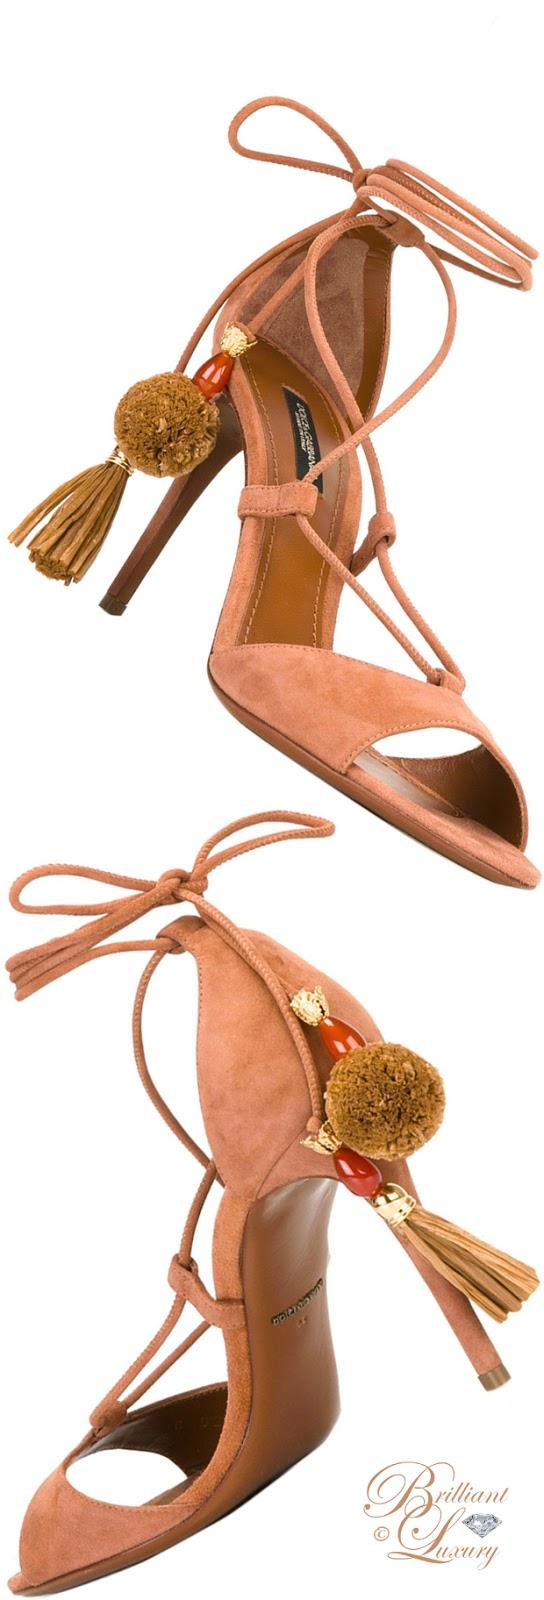 Brilliant Luxury ♦ Dolce & Gabbana Pom Pom Tassel Sandals